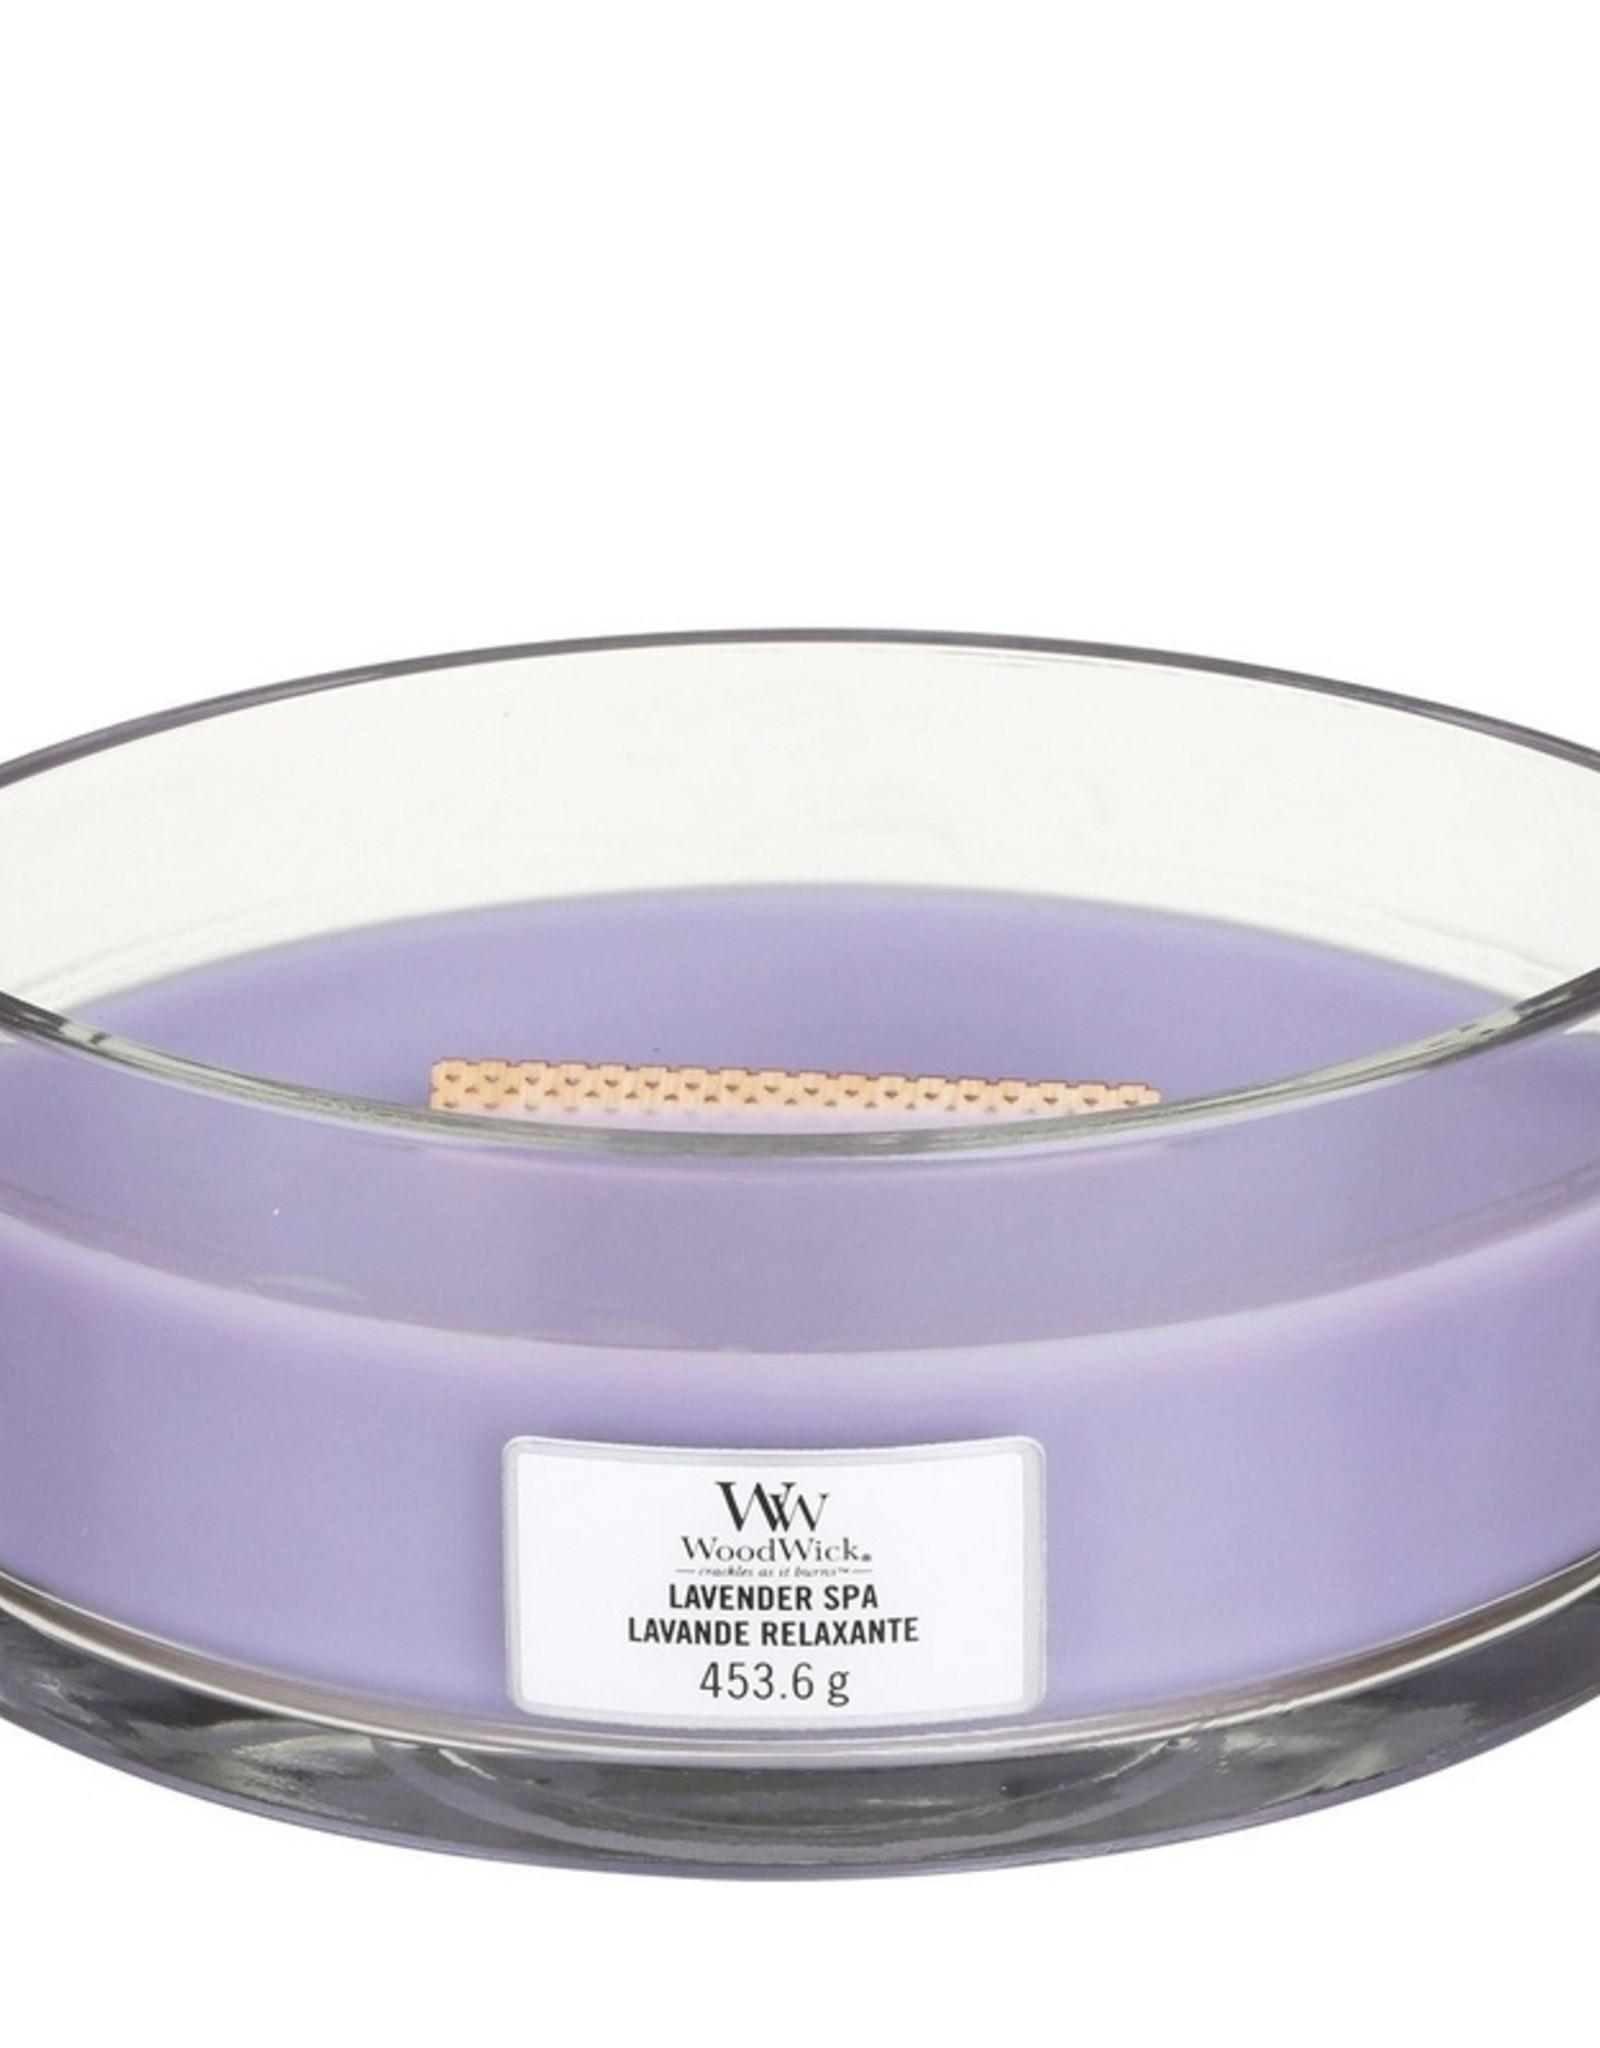 Woodwick Woodwick Lavender Spa Ellipse Candle